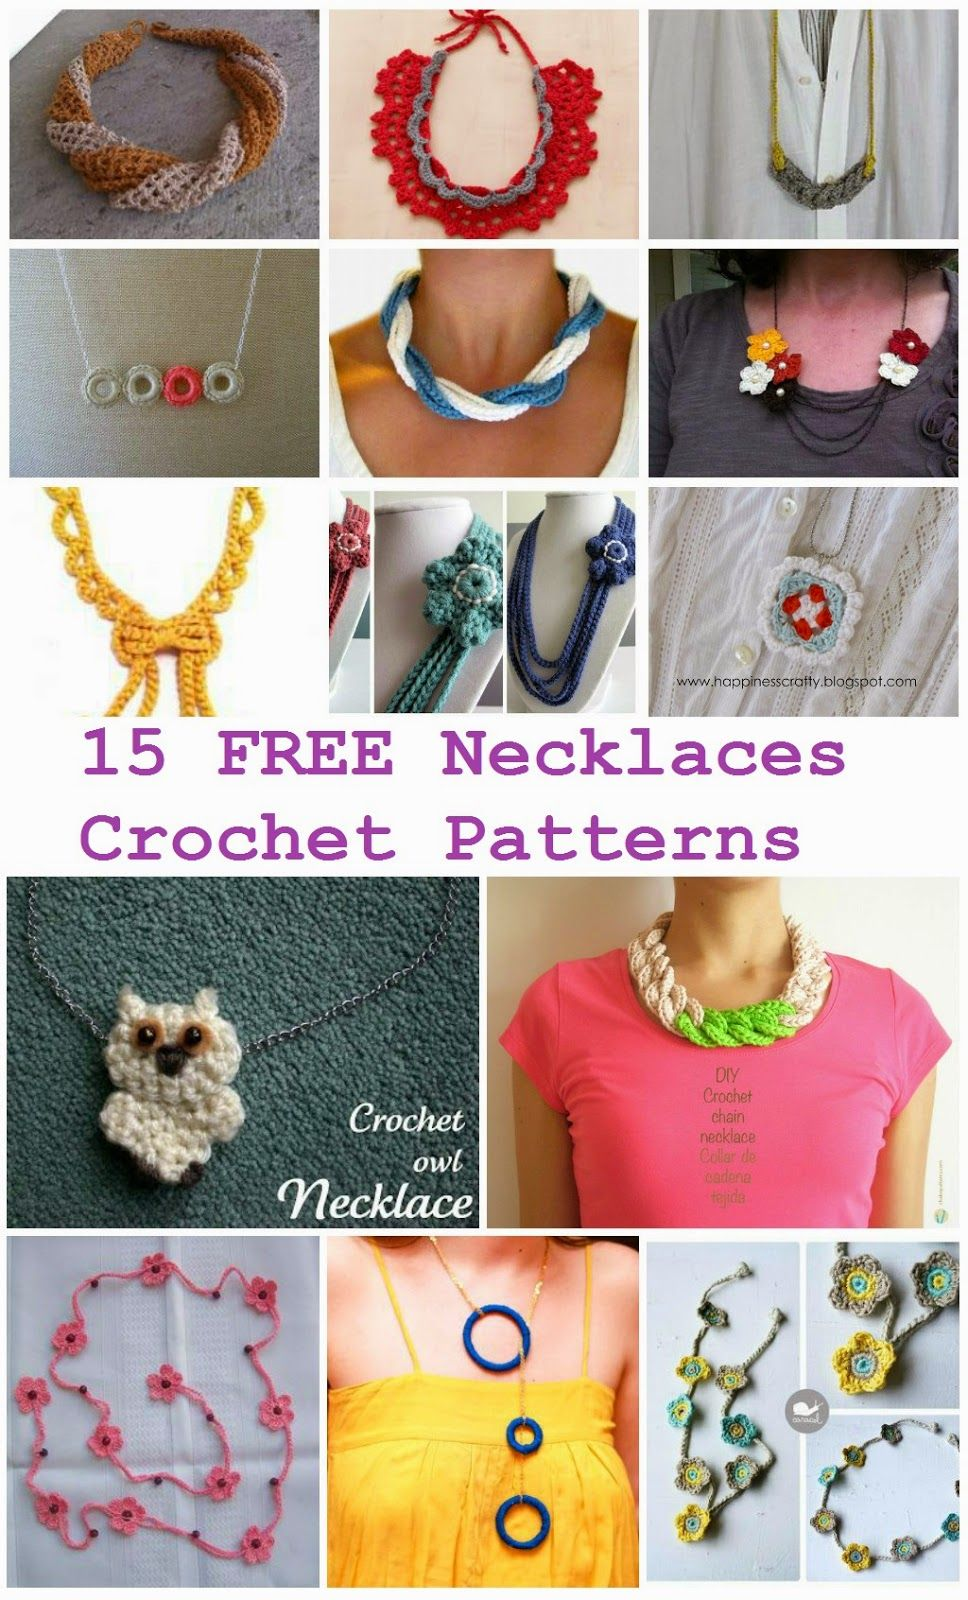 15 FREE Necklaces Crochet PatternsCrochet chain necklace | DIY ...